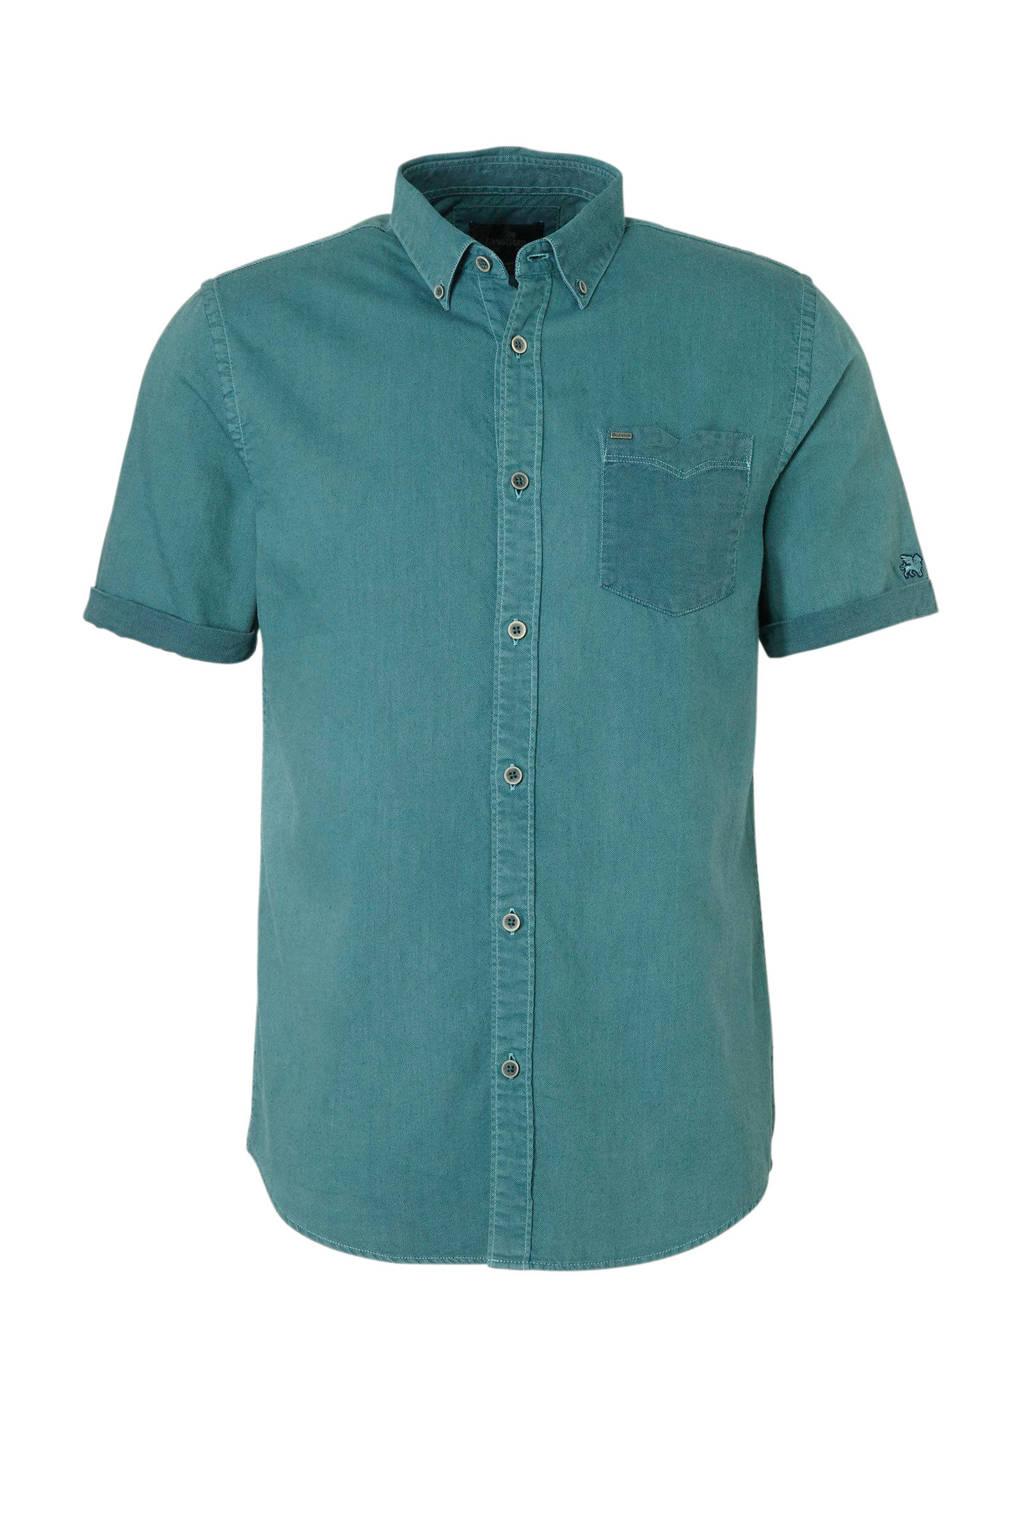 Vanguard regular fit overhemd groen, Groen